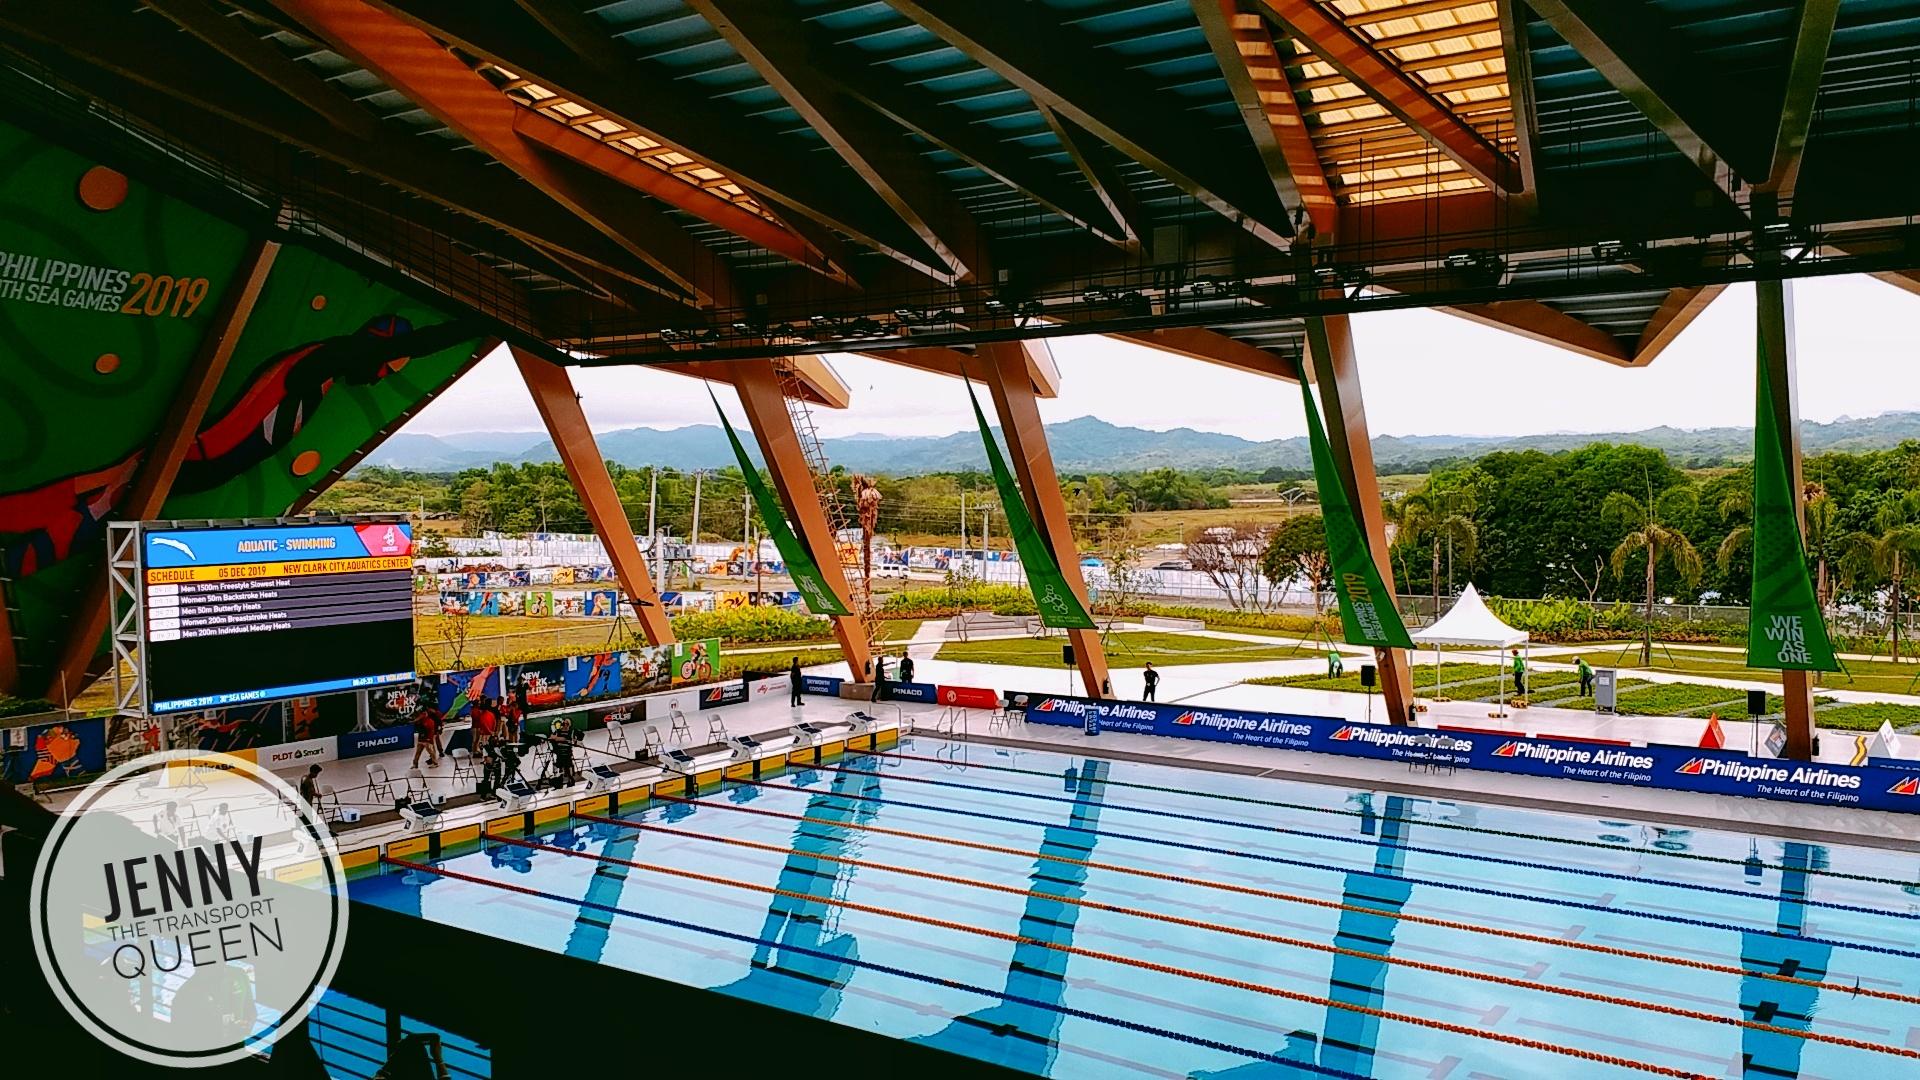 Aquatic Center, New Clark City